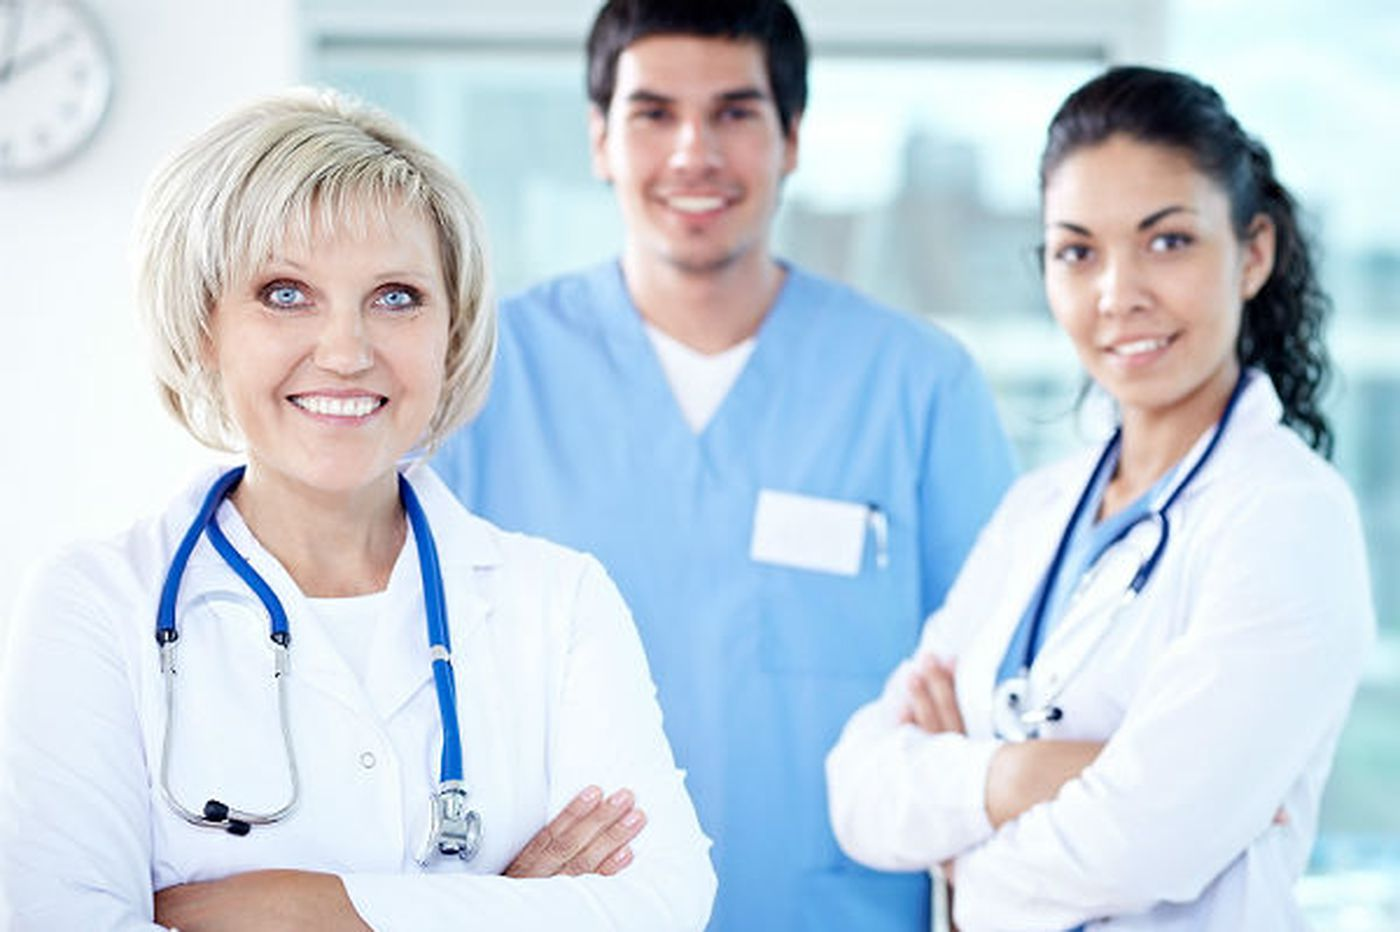 Is a male nurse worth $5,148 more than a female nurse?